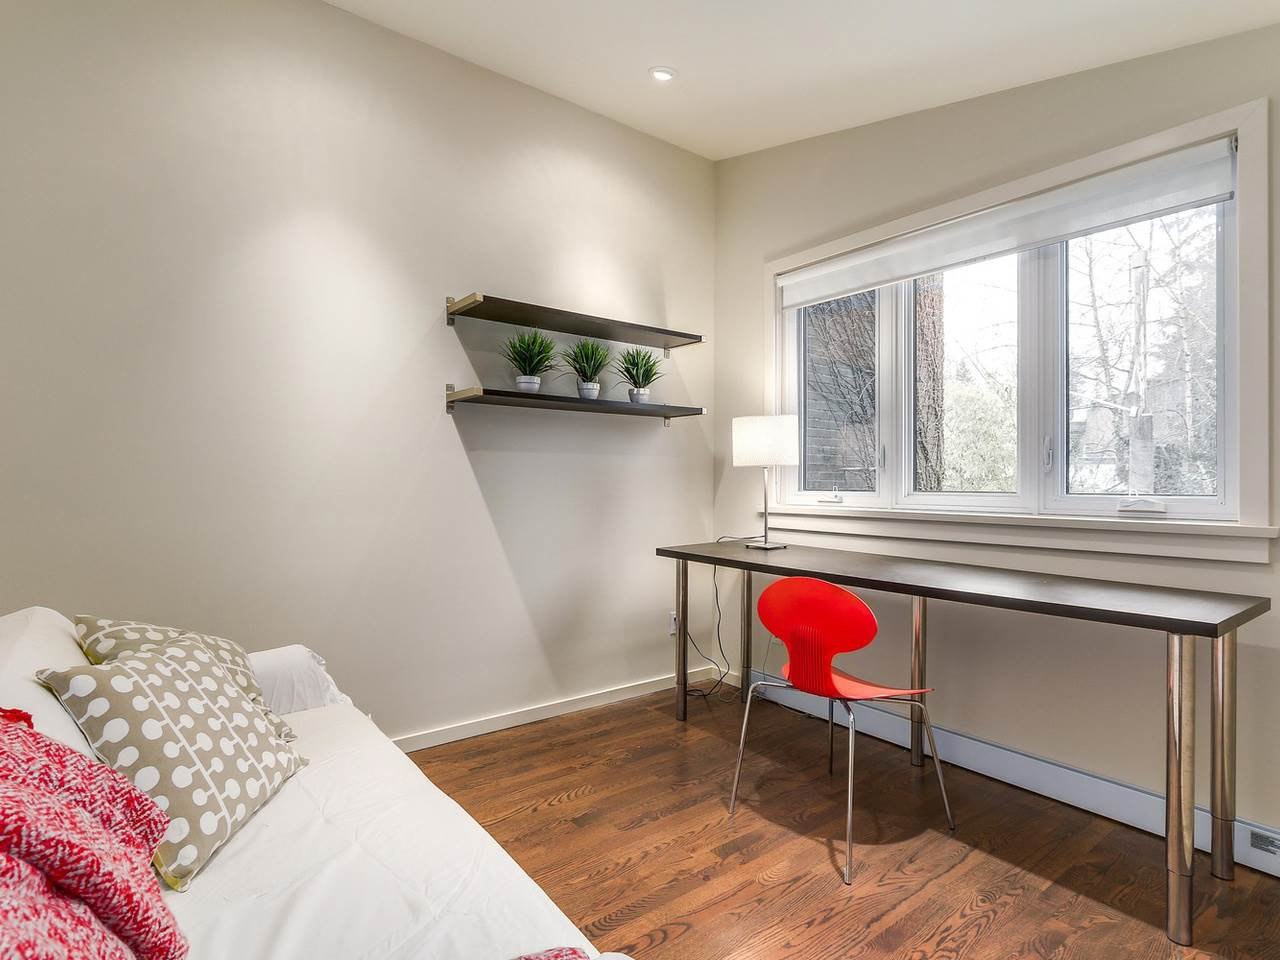 Photo 19: Photos: 3708 EDGEMONT Boulevard in North Vancouver: Edgemont House Fourplex for sale : MLS®# R2138514